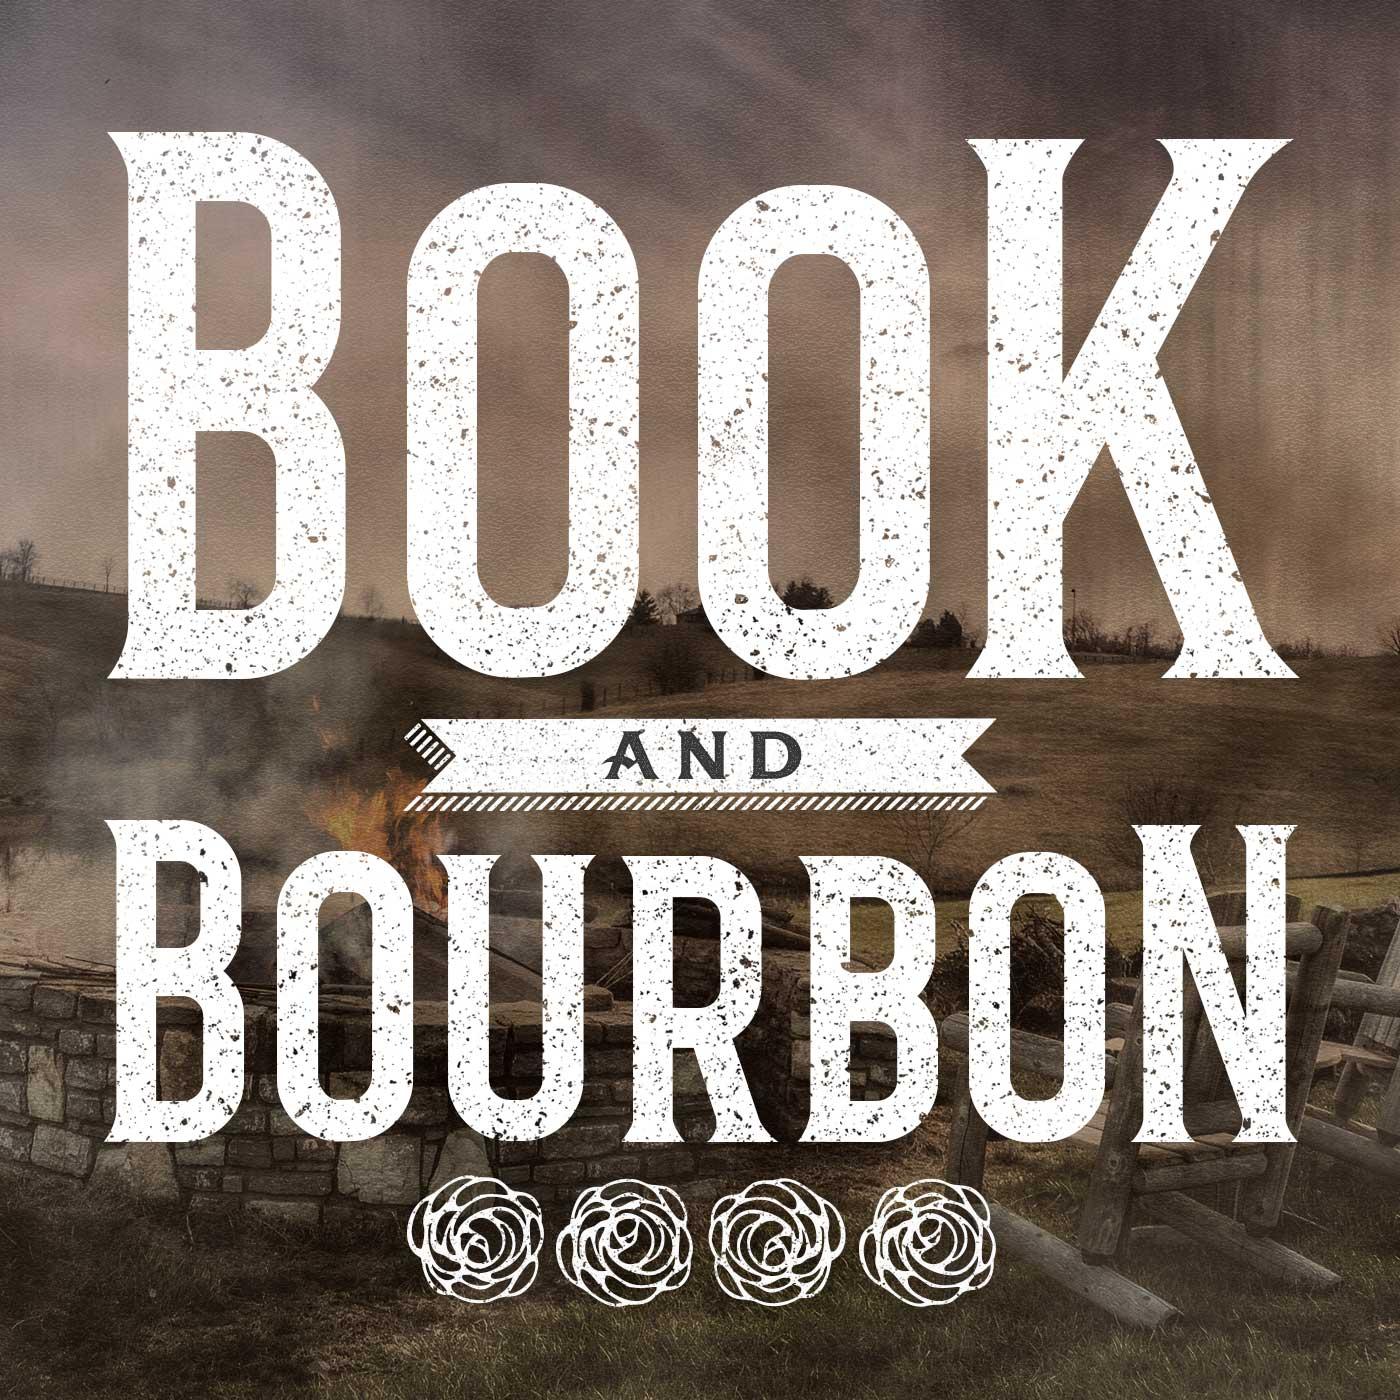 Book and Bourbon show art